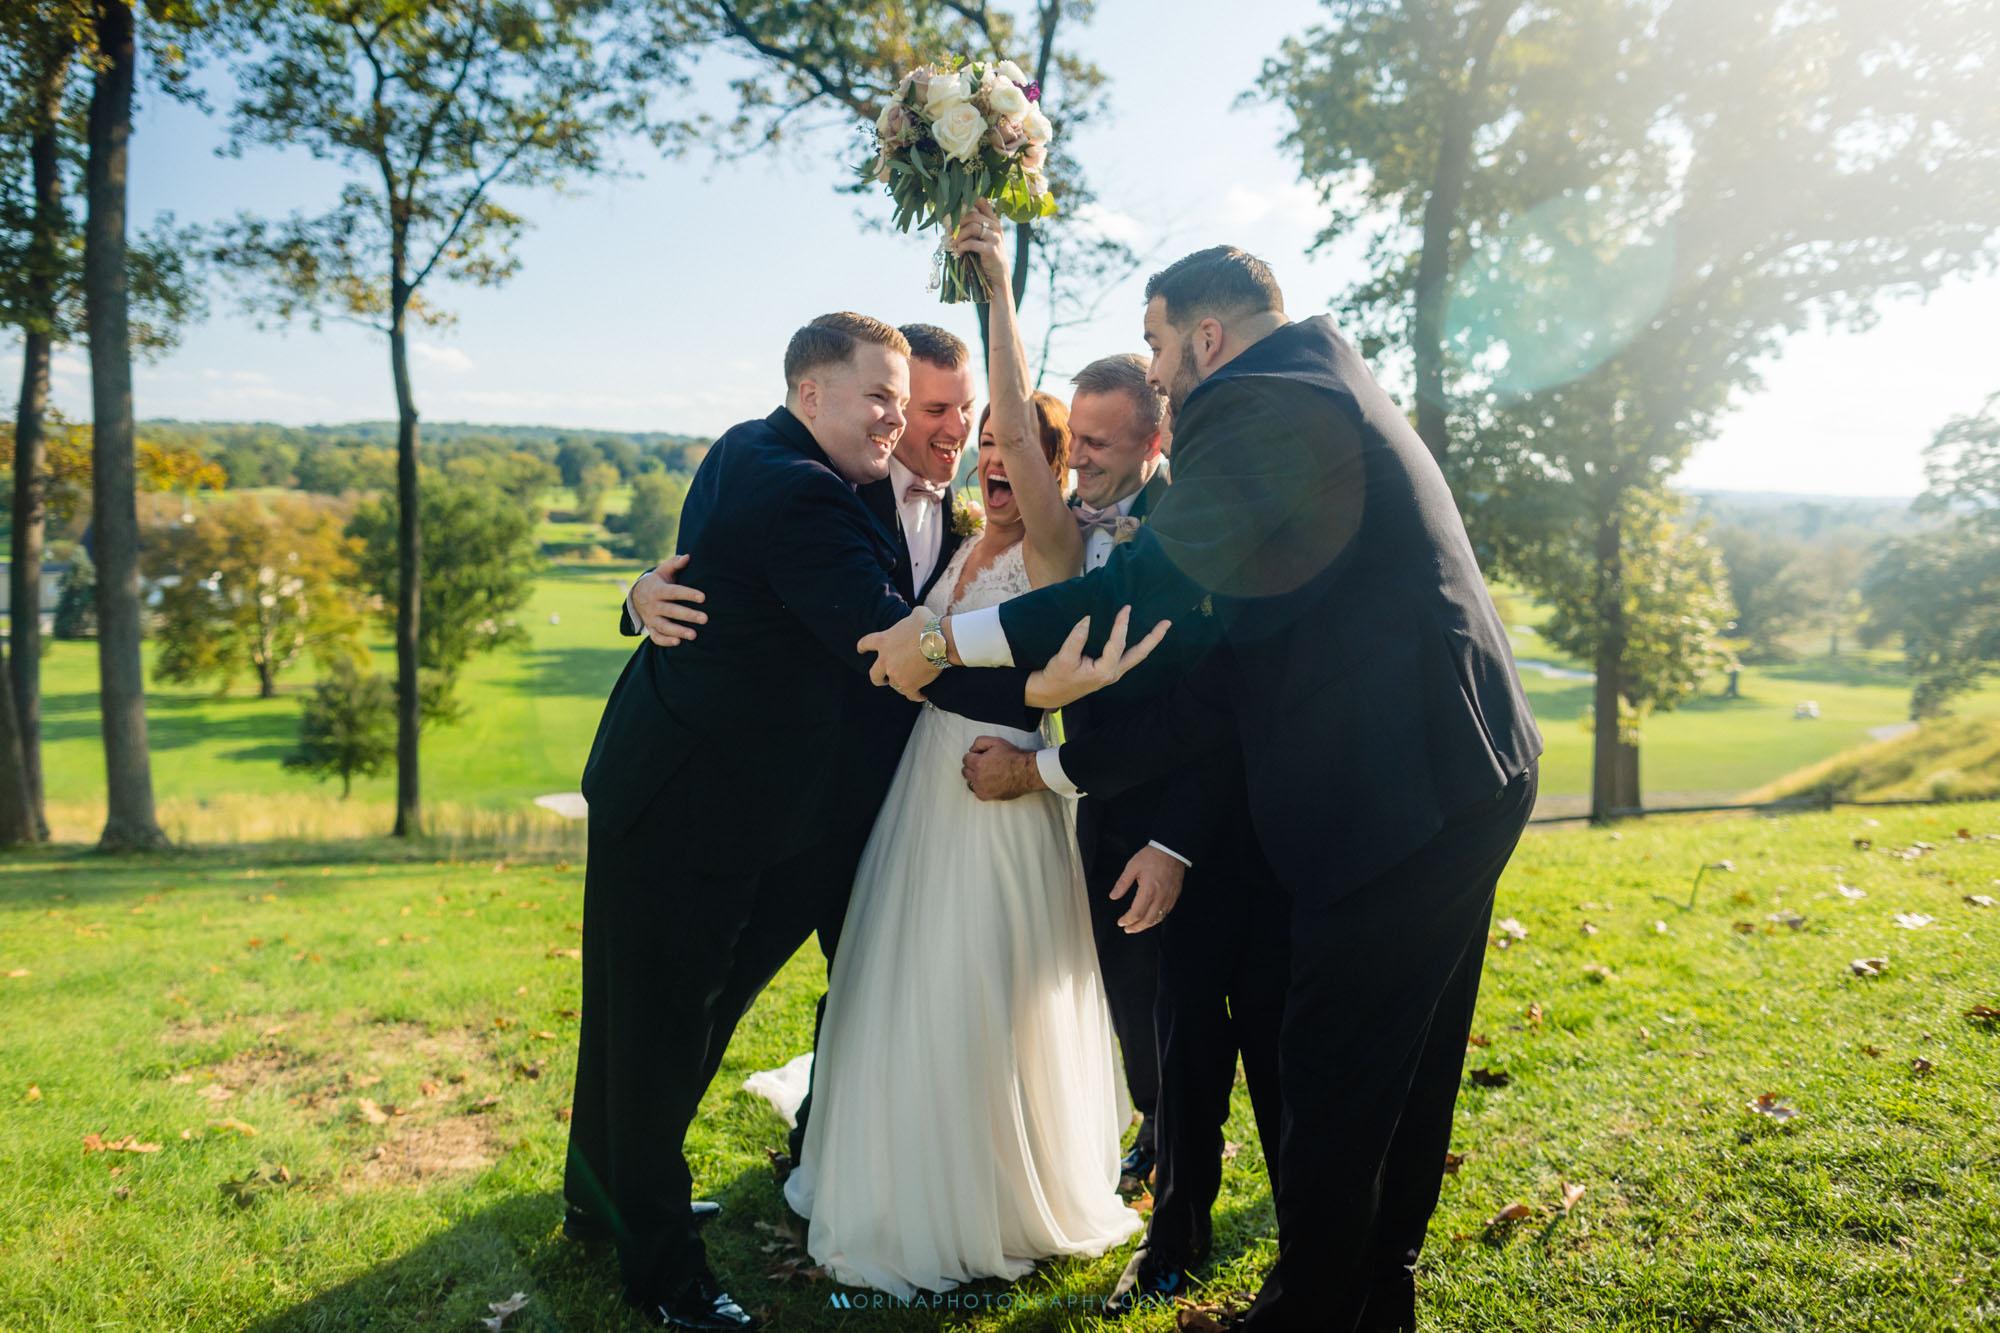 Colleen & Bill Wedding at Manufacturers' Golf & Country Club wedding 0054.jpg